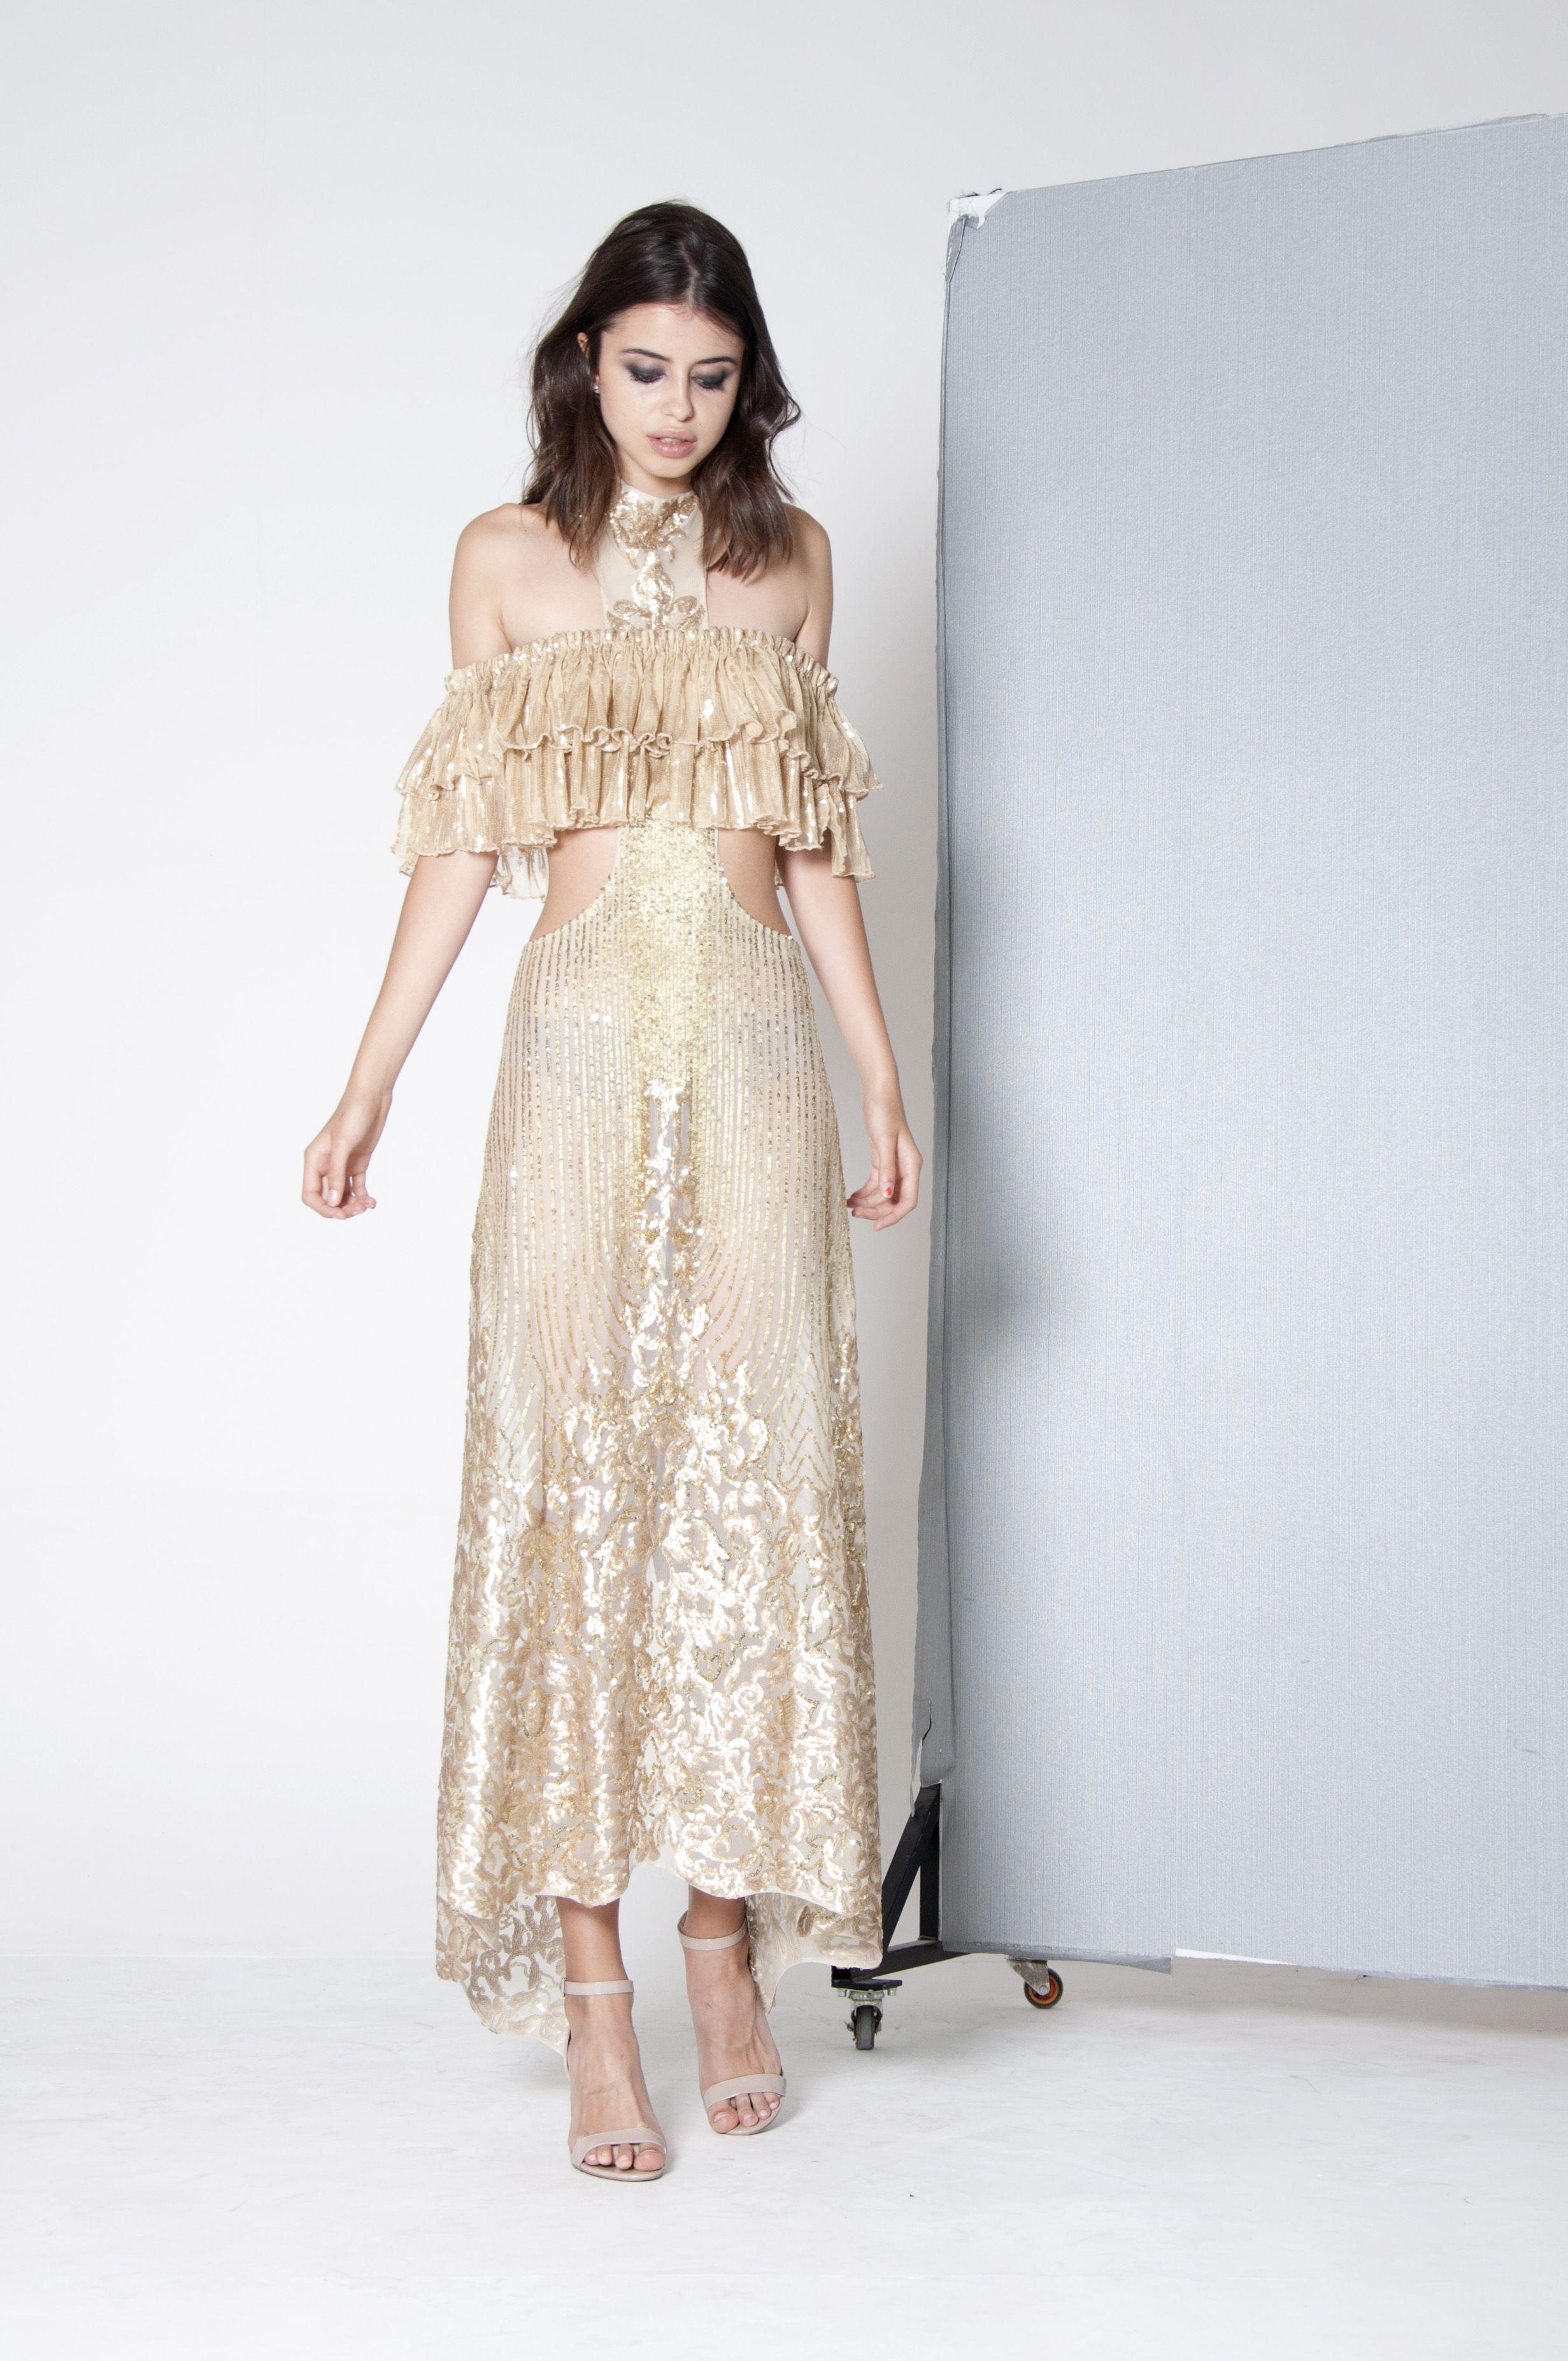 ee1f0dc431d SS17 womenswear by JIRI KALFAR